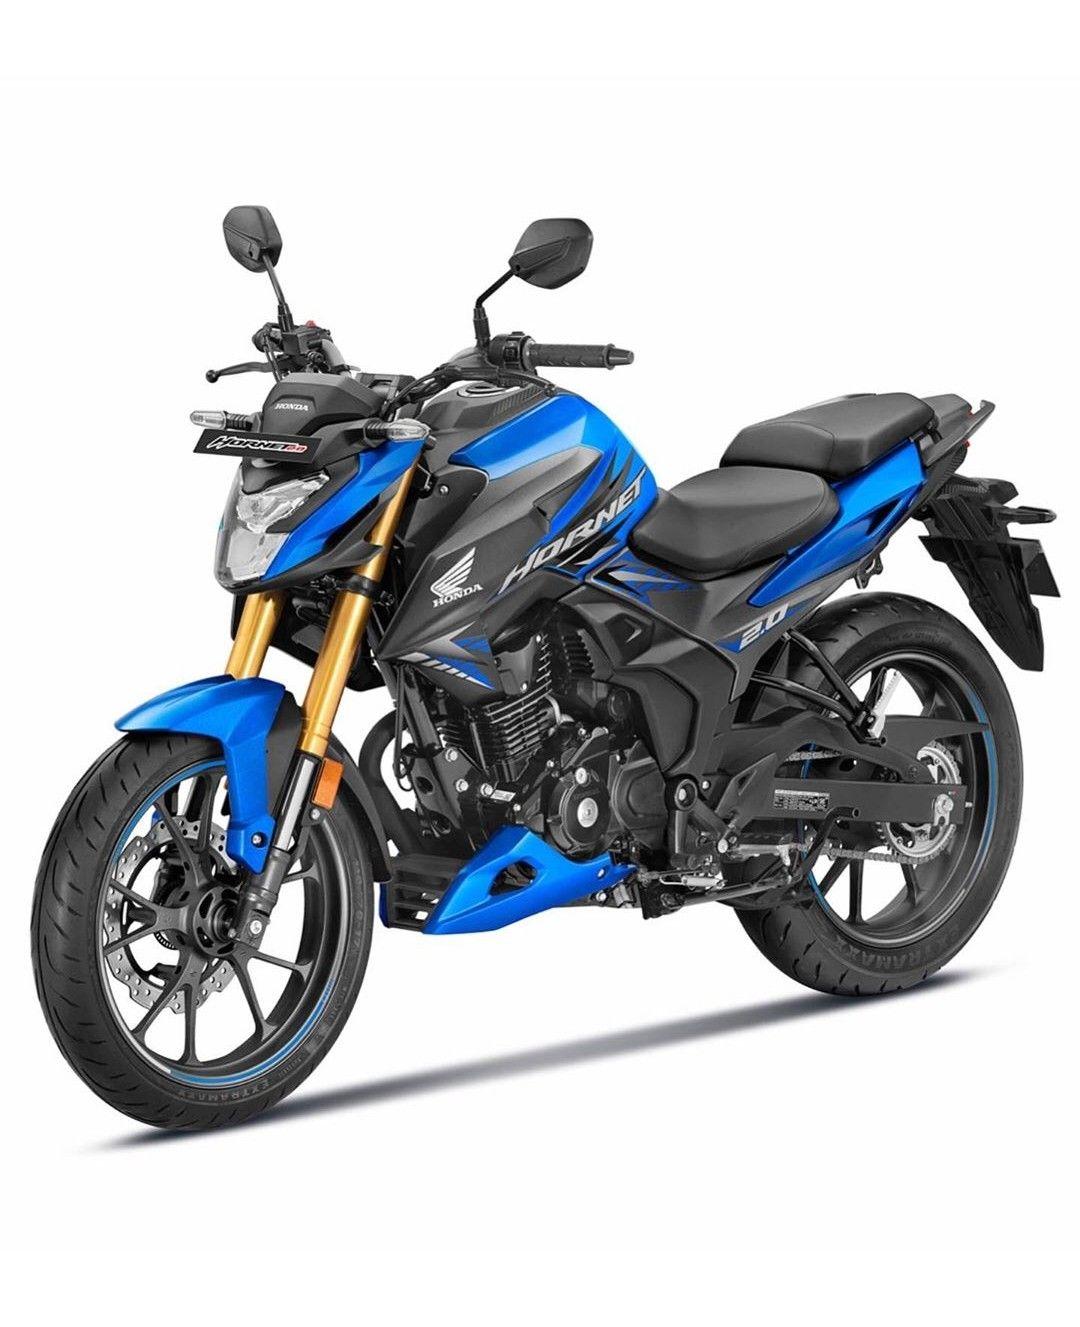 New Honda Hornet In 2020 Honda Bike Photoshoot New Honda